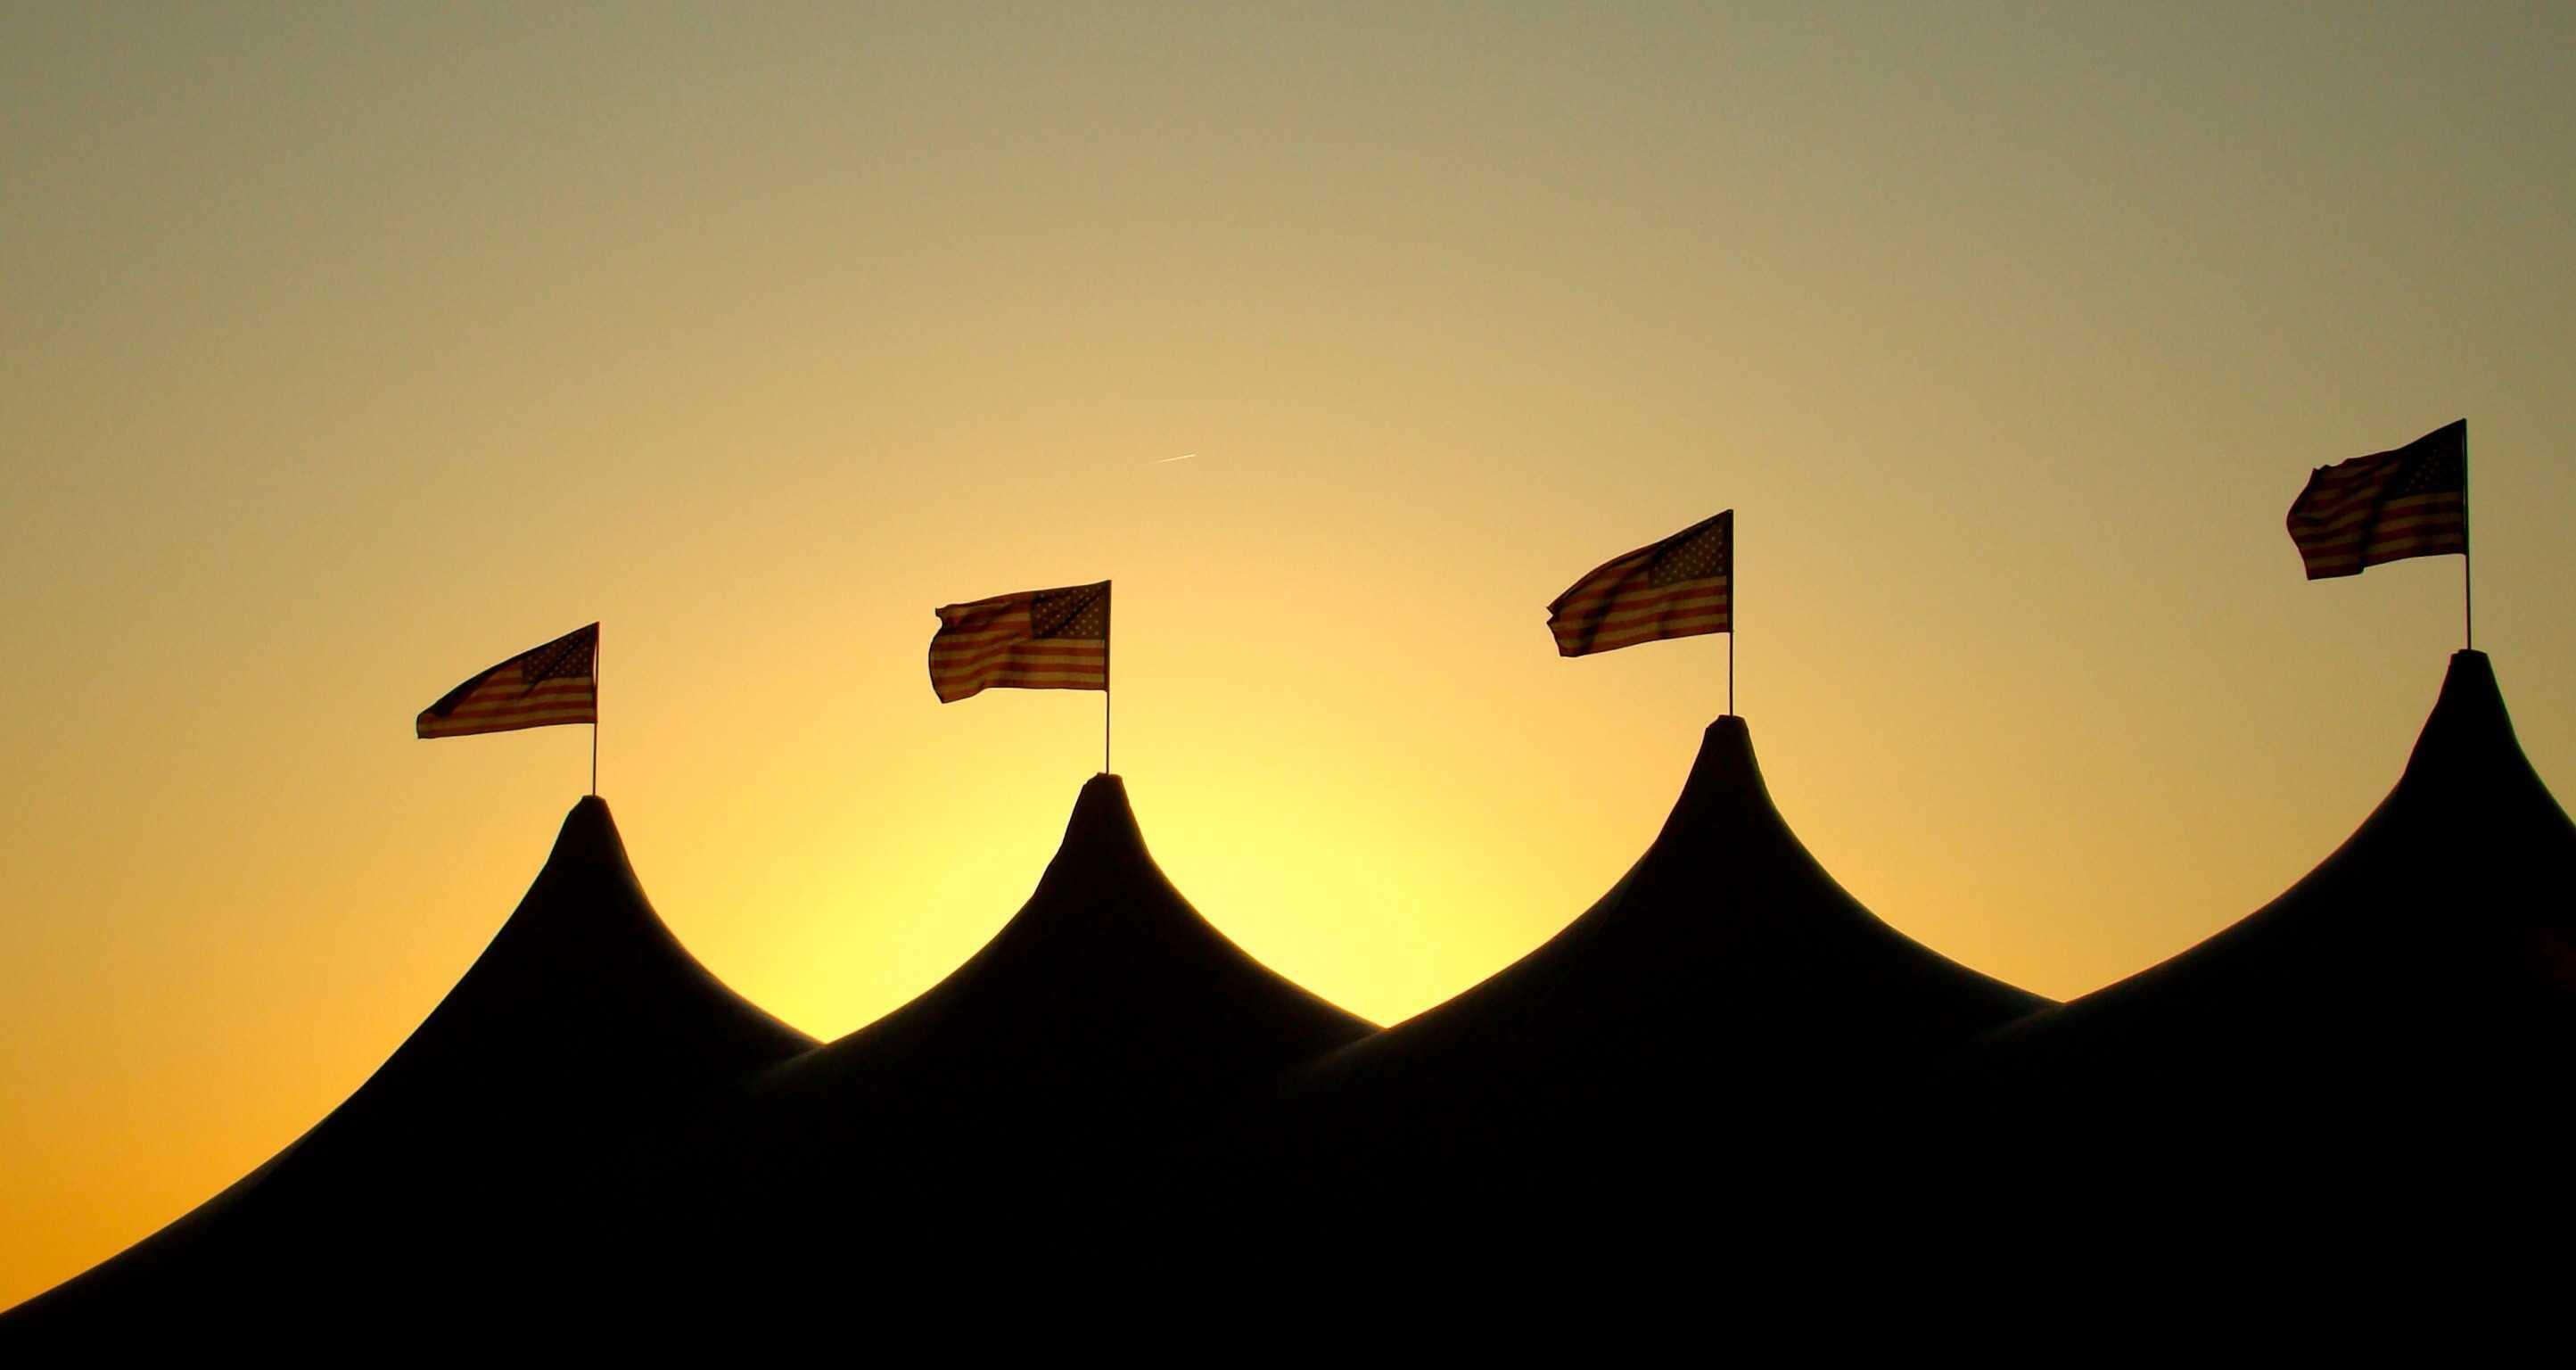 Celebration Tents Silhouette Norfolk Virginia & Life Style u2013 MotionOne Studios